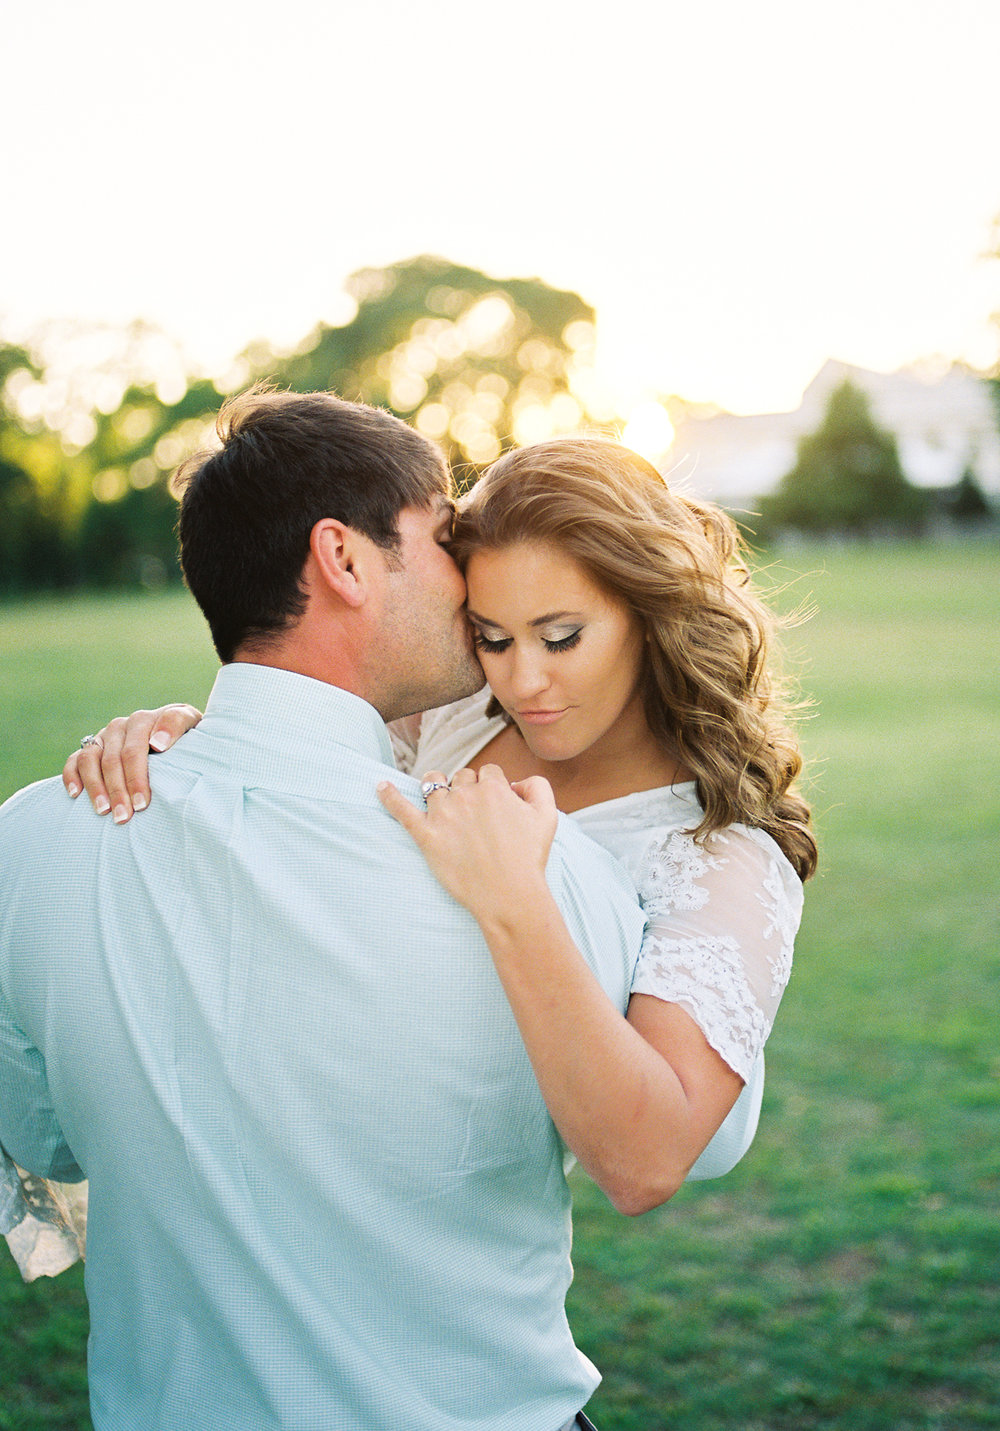 Victoria & Justin - Engaged - © Kaitlyn Stoddard -Carter-2.jpg